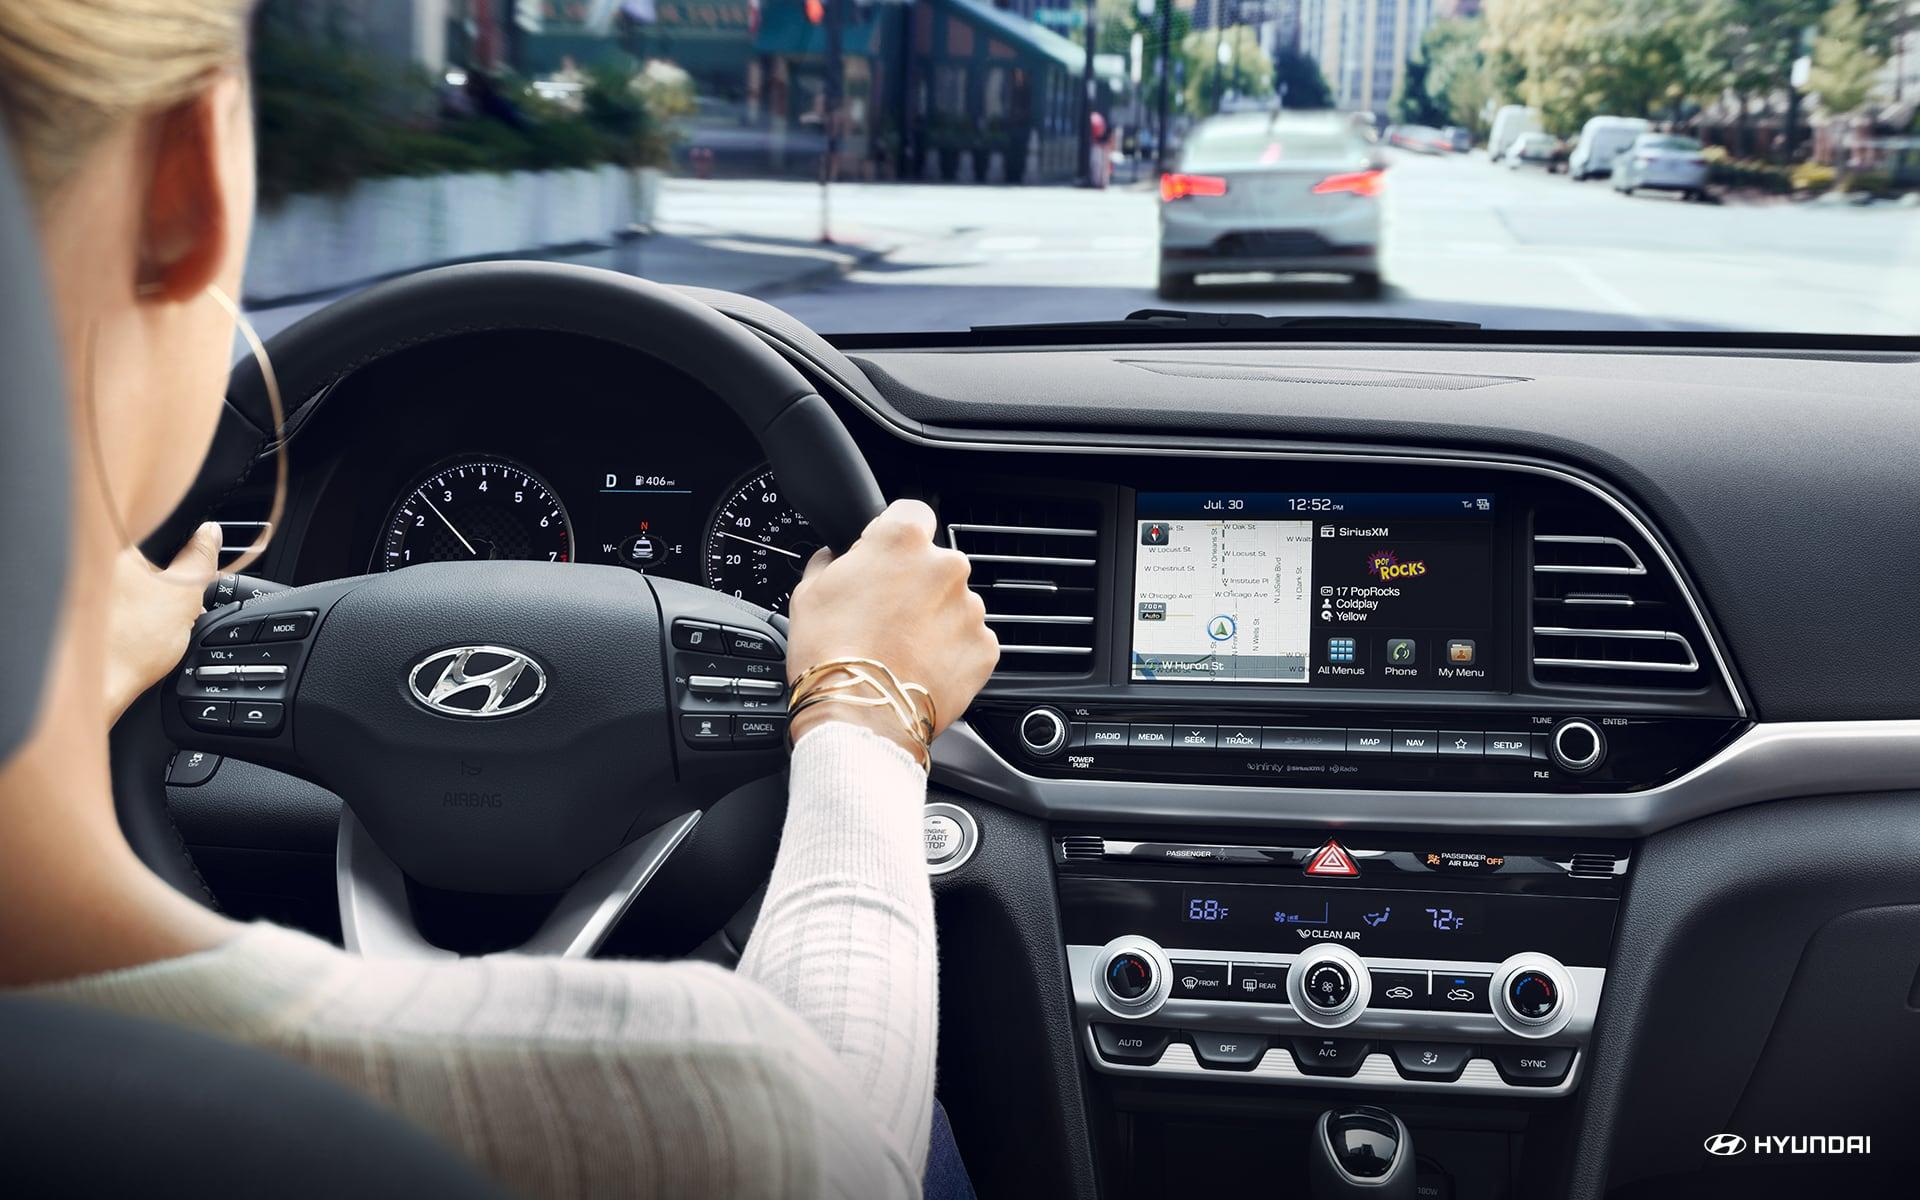 2020 Hyundai Elantra Technology